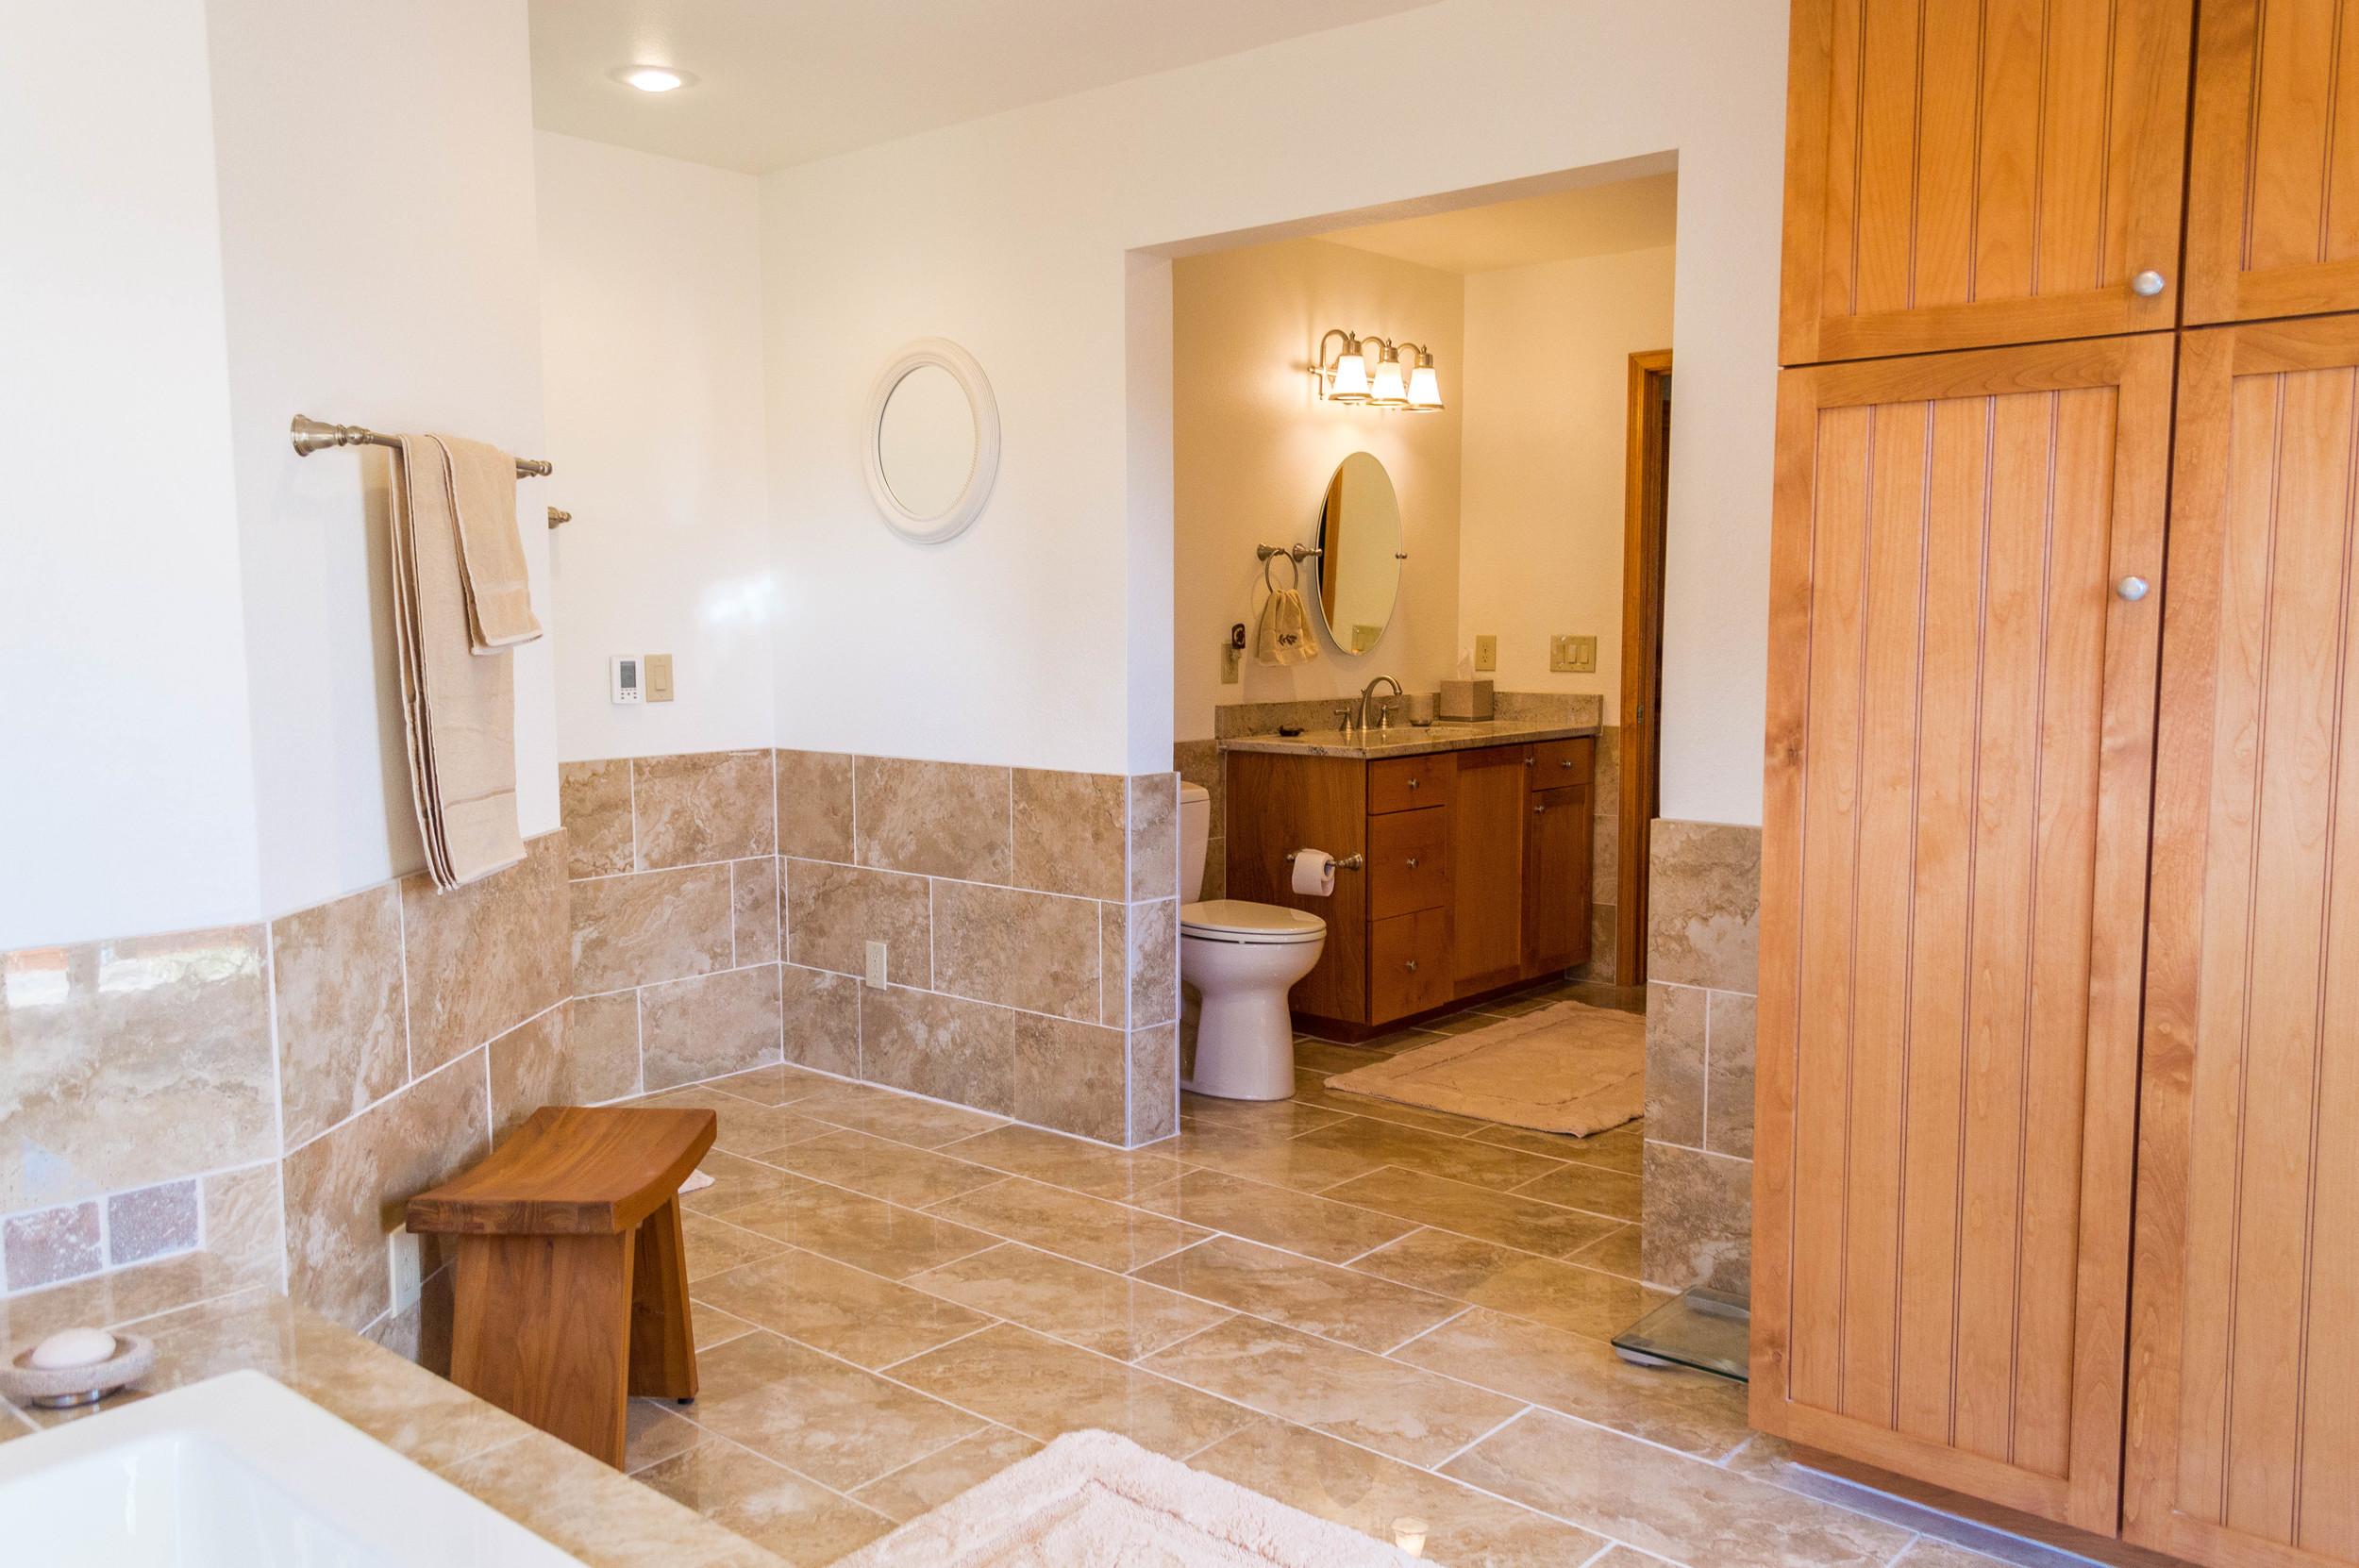 Completed remodeled bathroom